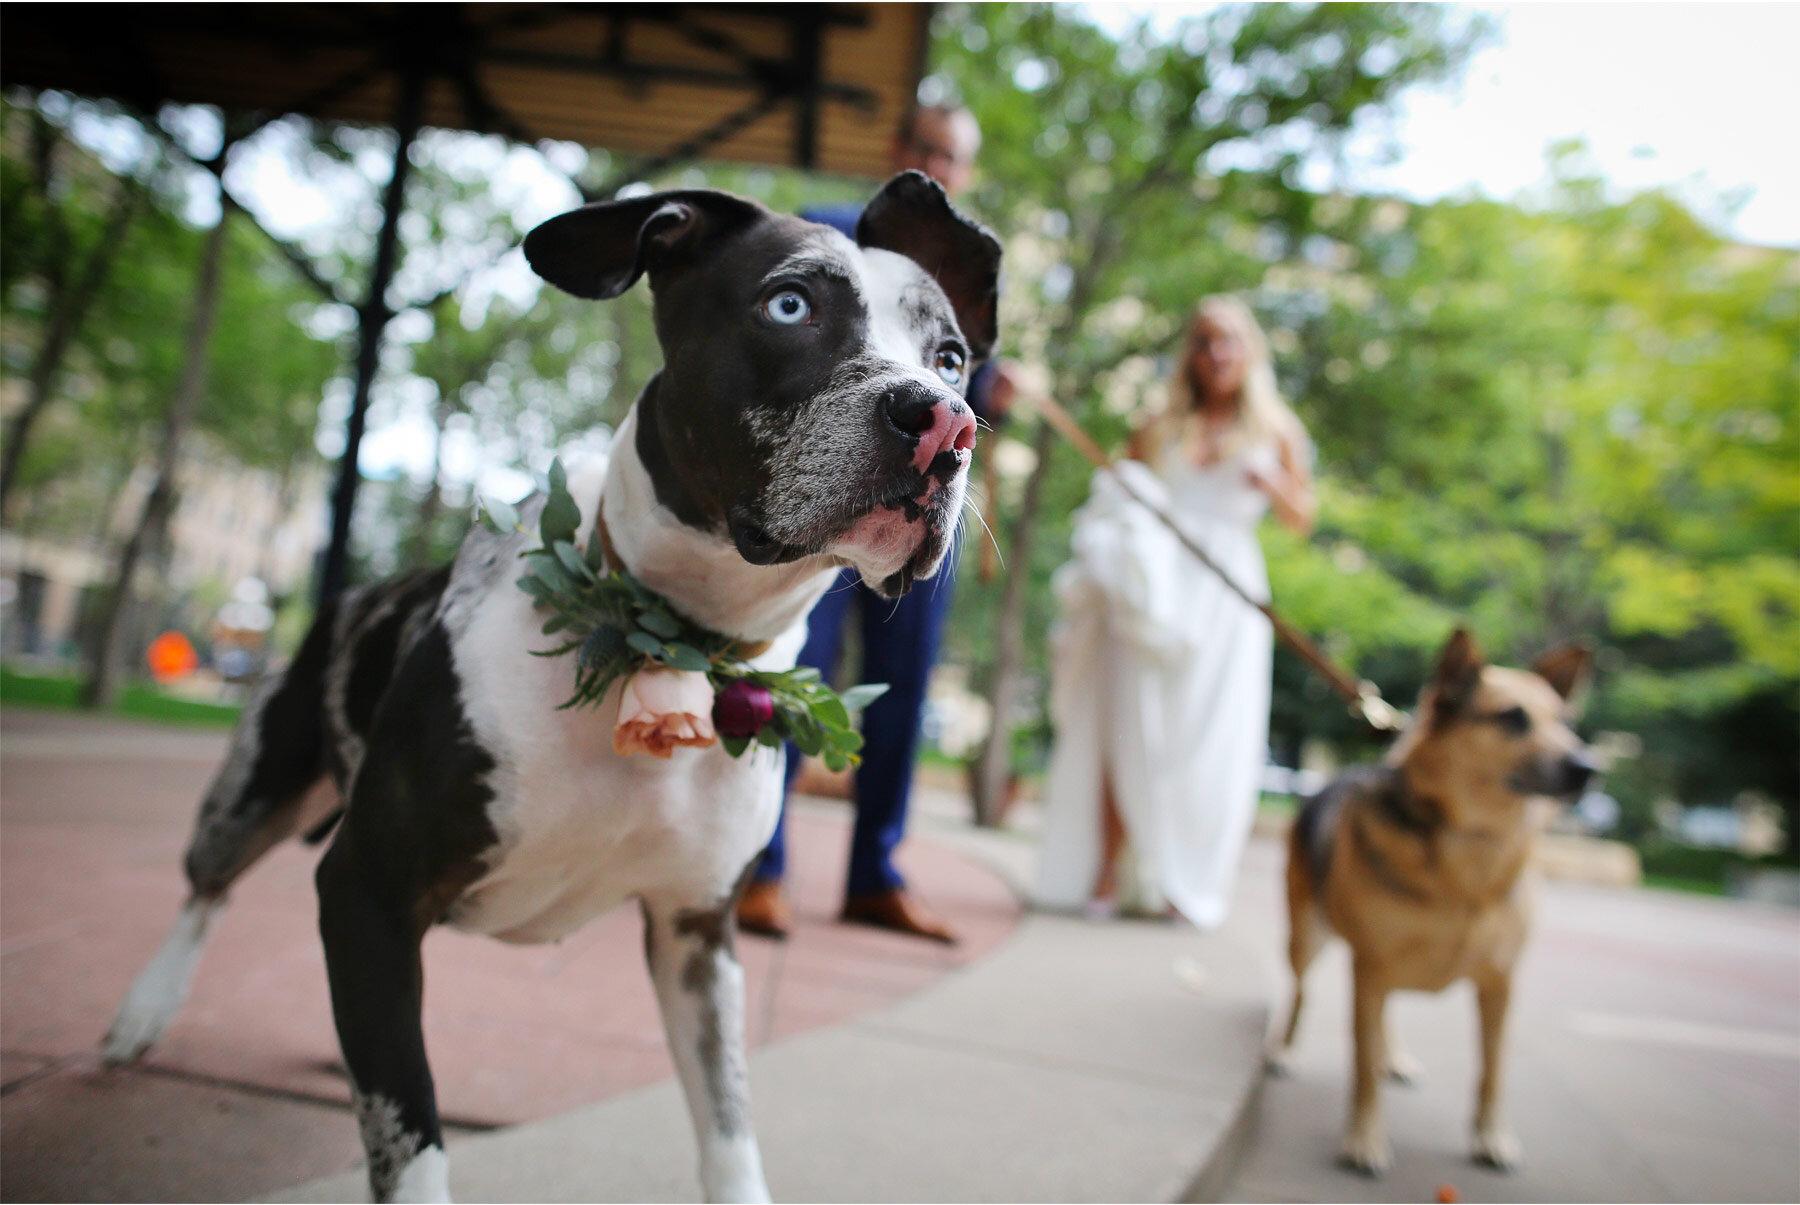 07-Vick-Photography-Wedding-Minneapolis-Minnesota-Bride-Groom-Dogs-Danielle-and-Tom.jpg